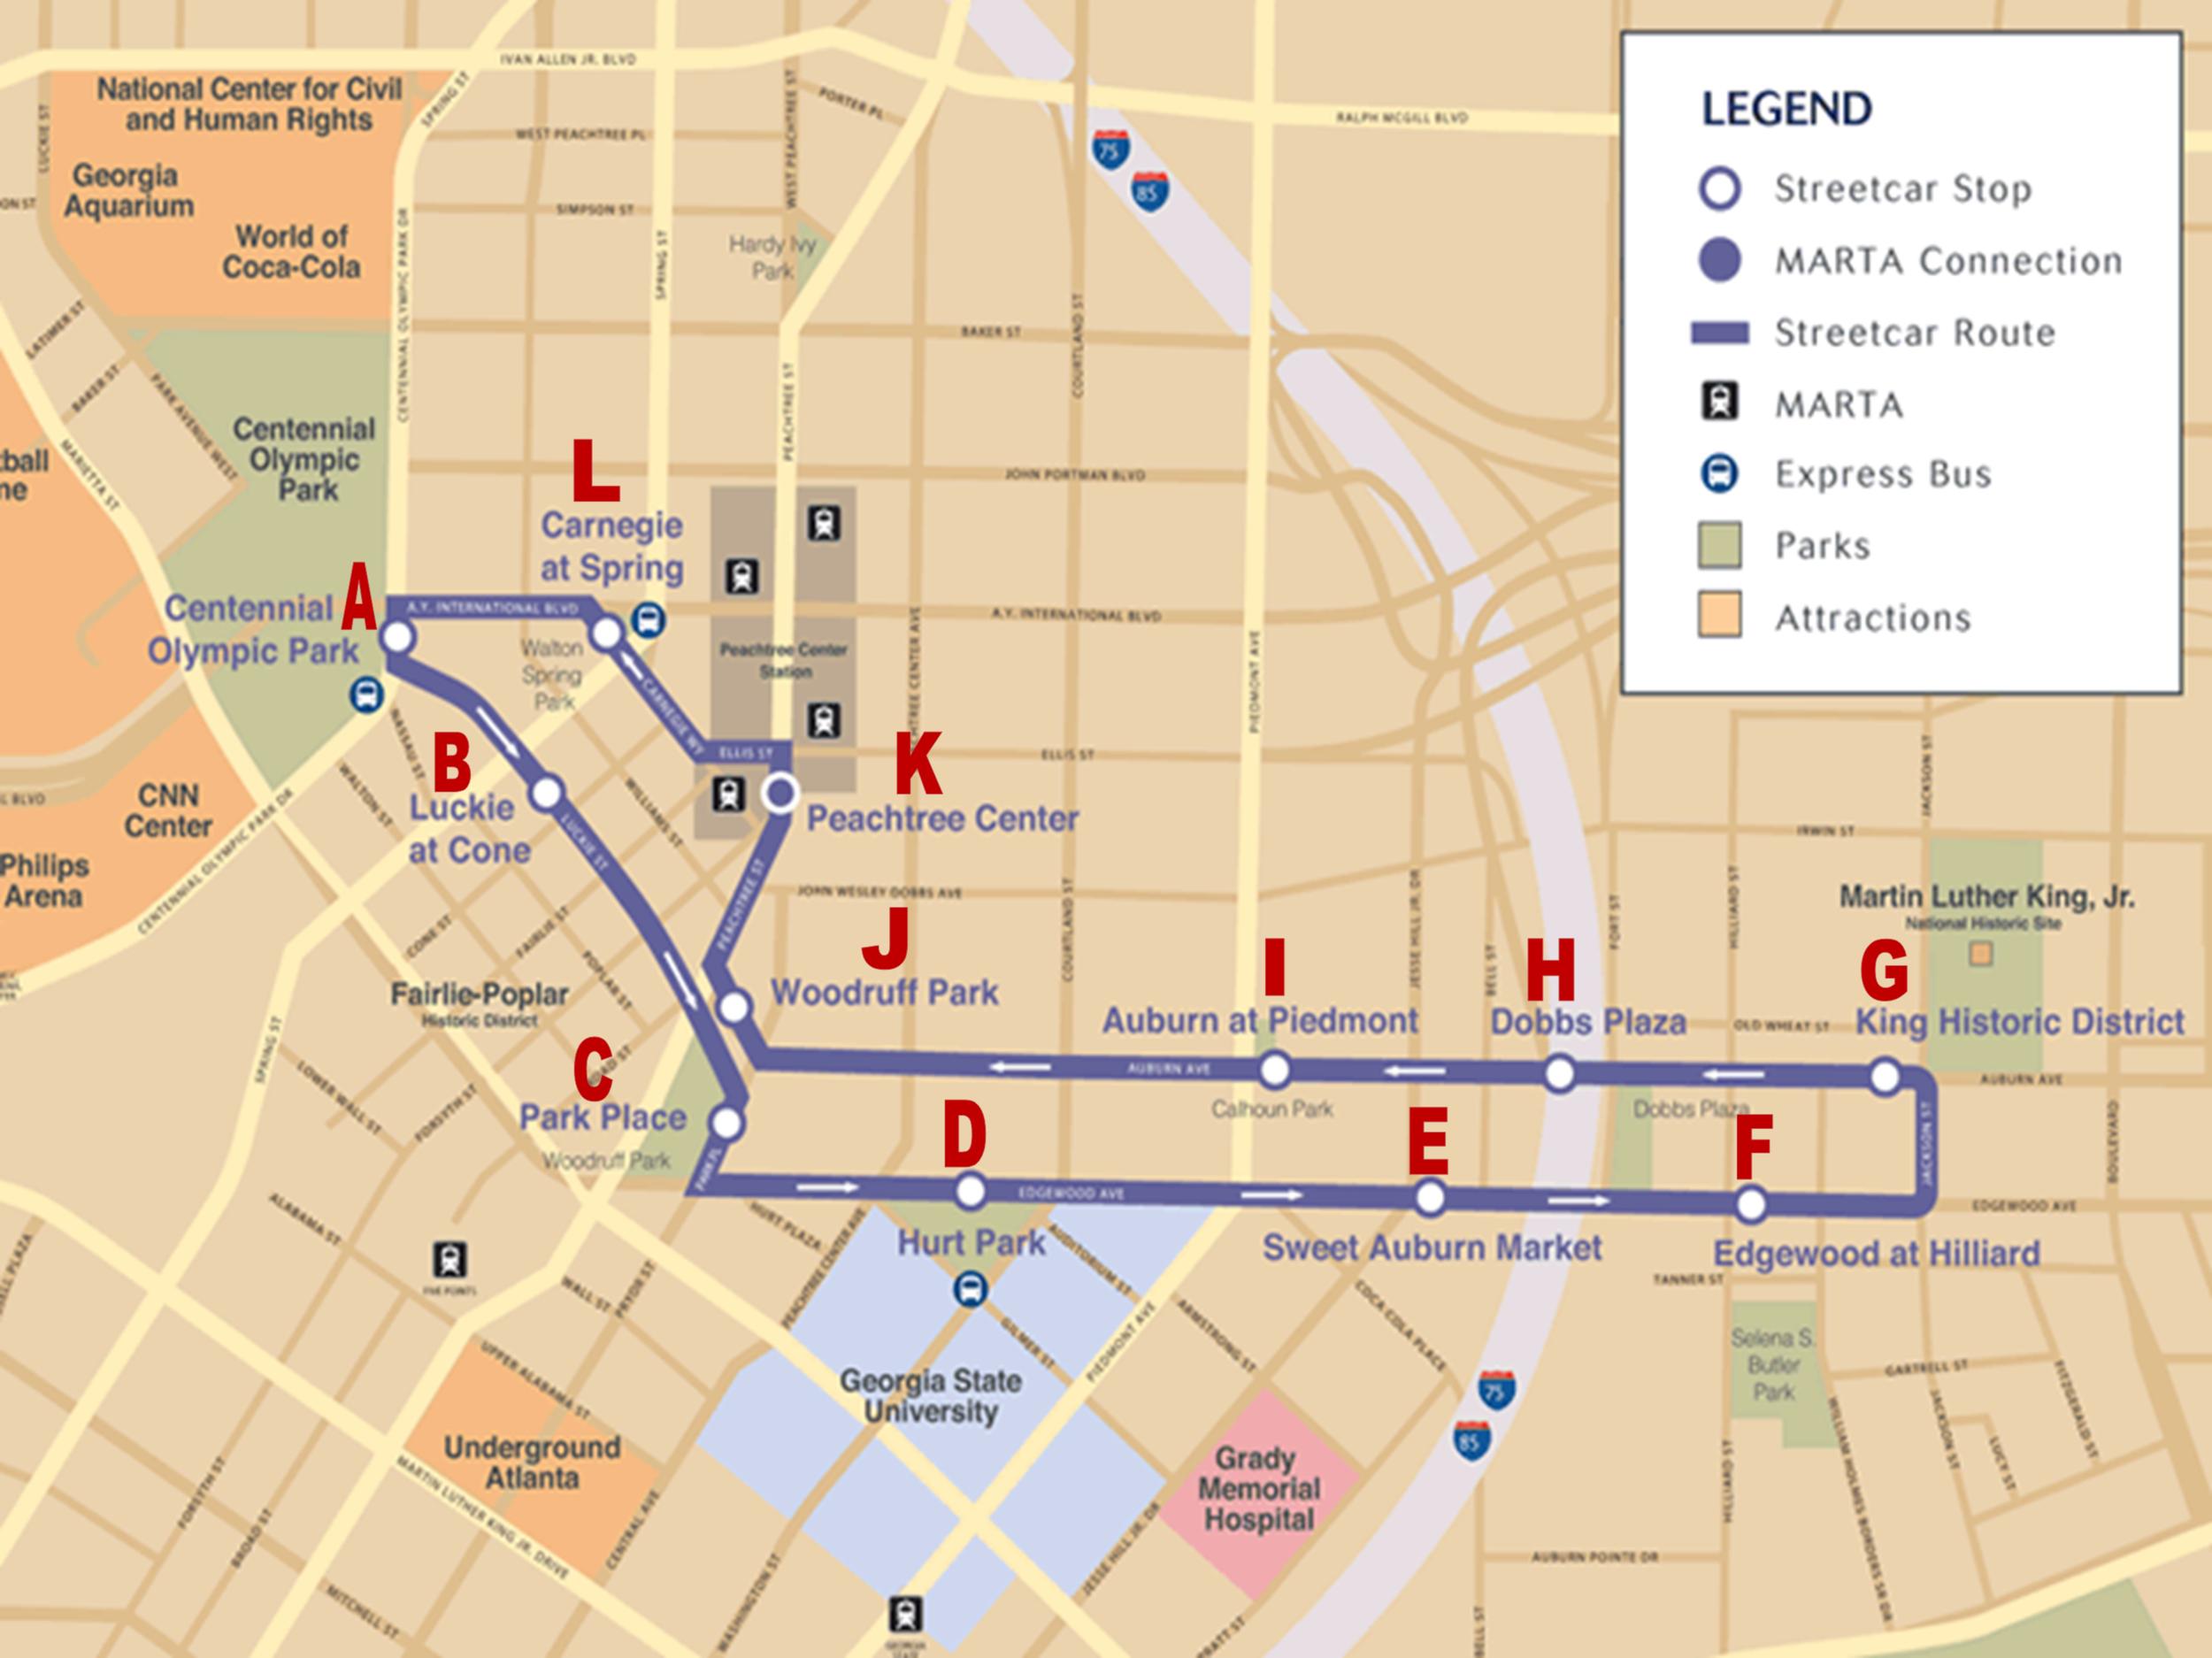 Atlanta Streetcar Route (click to enlarge)